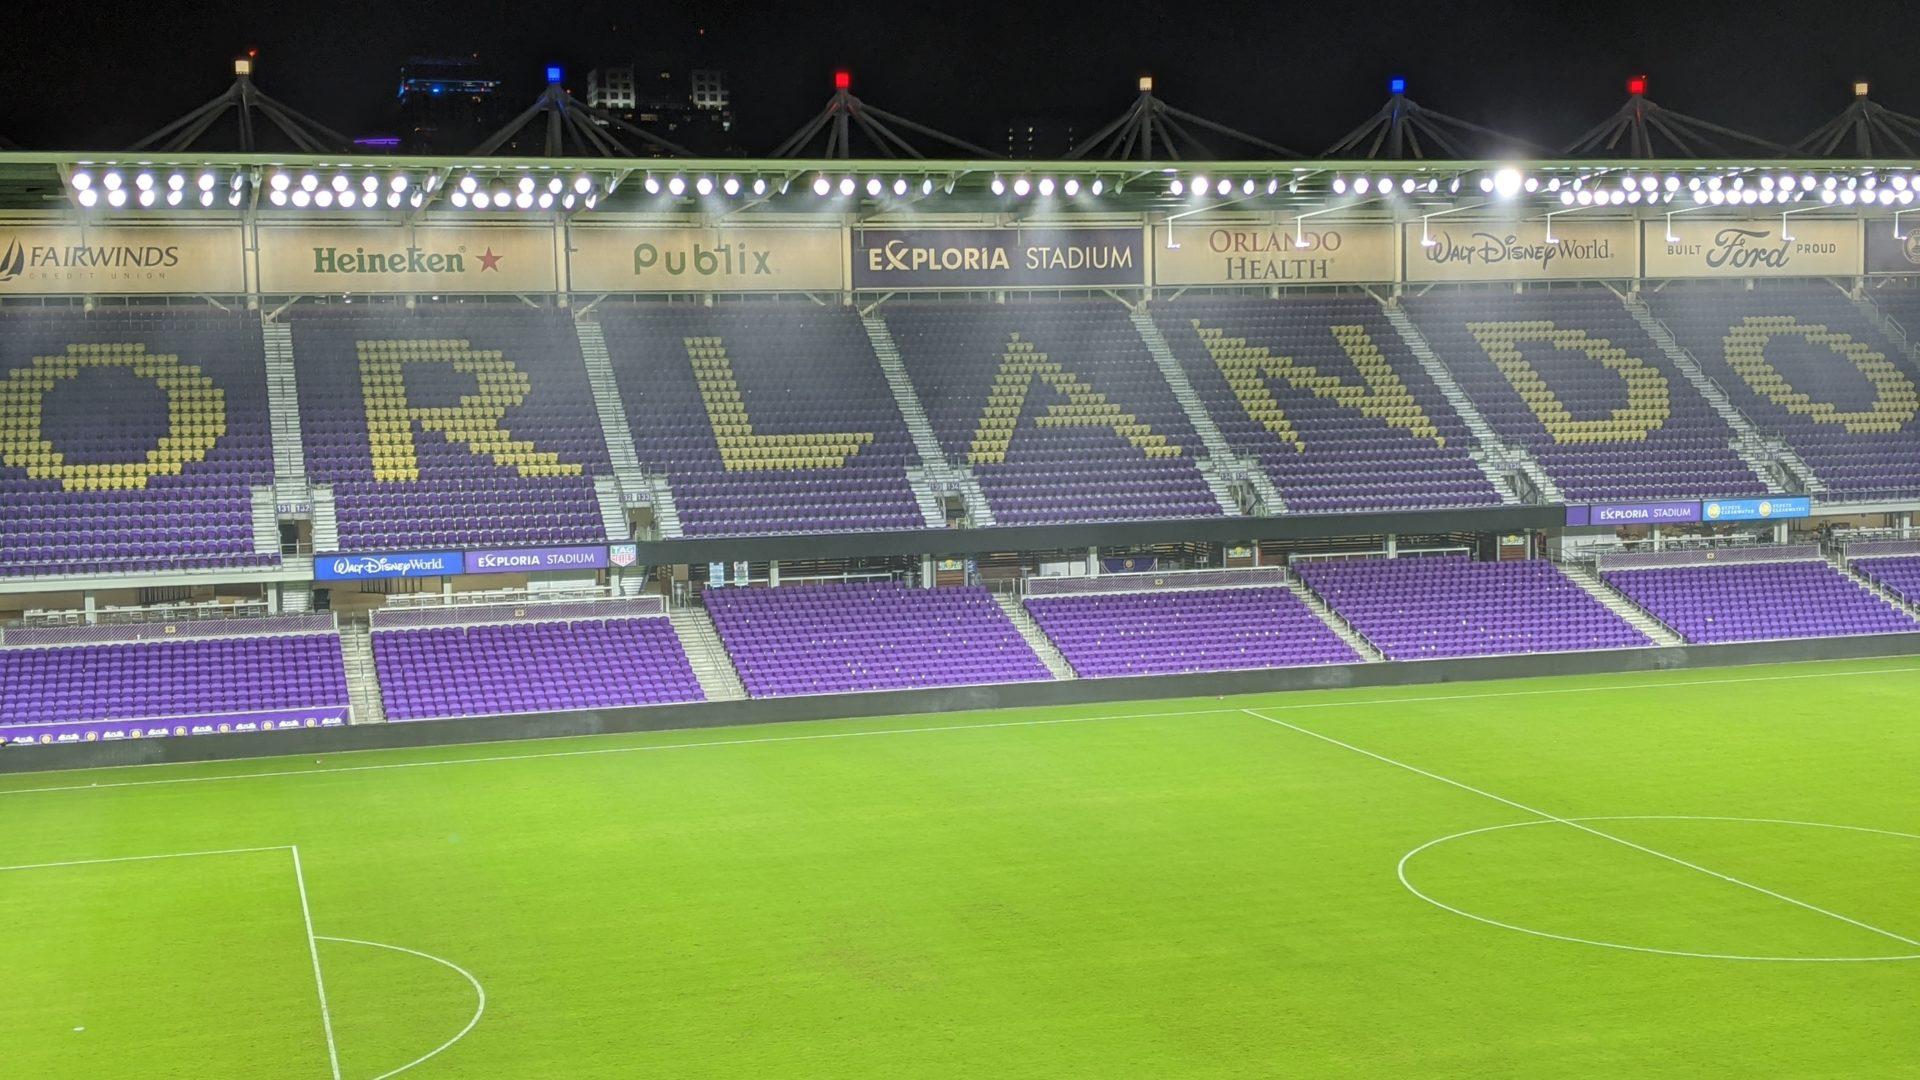 Orlando City announces 2020 MLS schedule